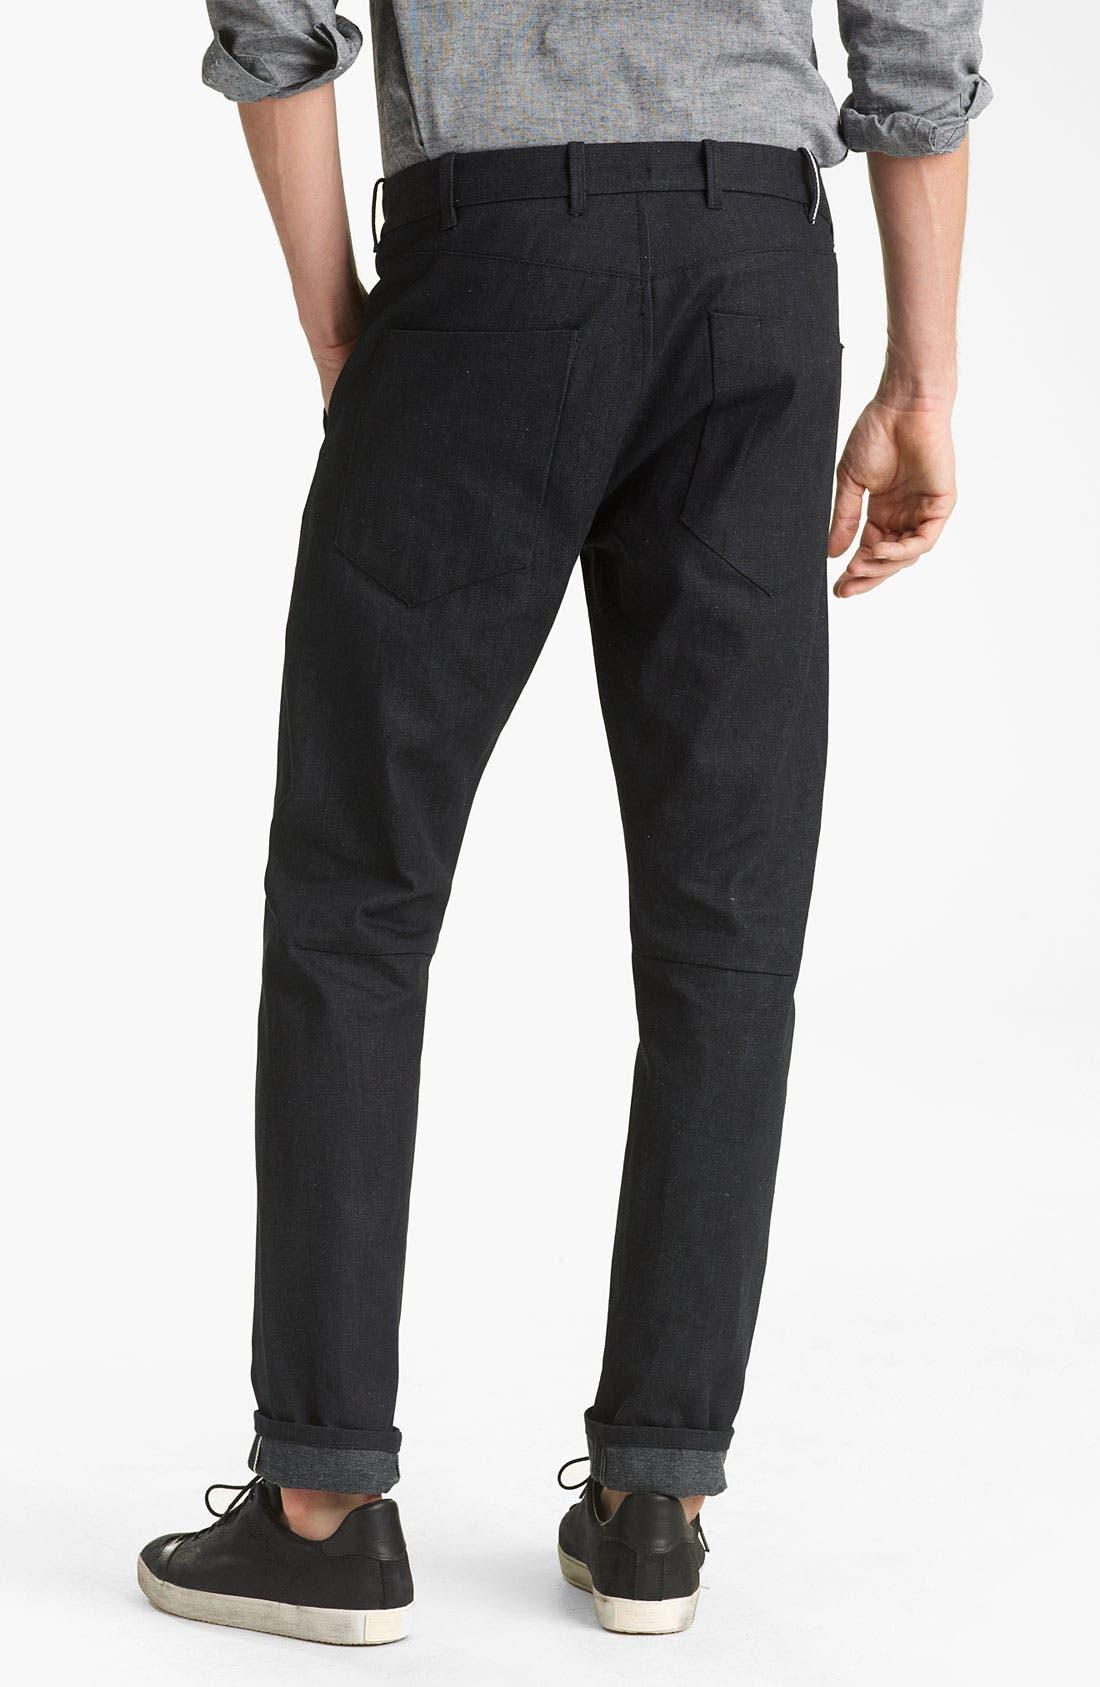 Main Image - Rogan 'Tunnel' Tapered Trouser Jeans (Indigo)